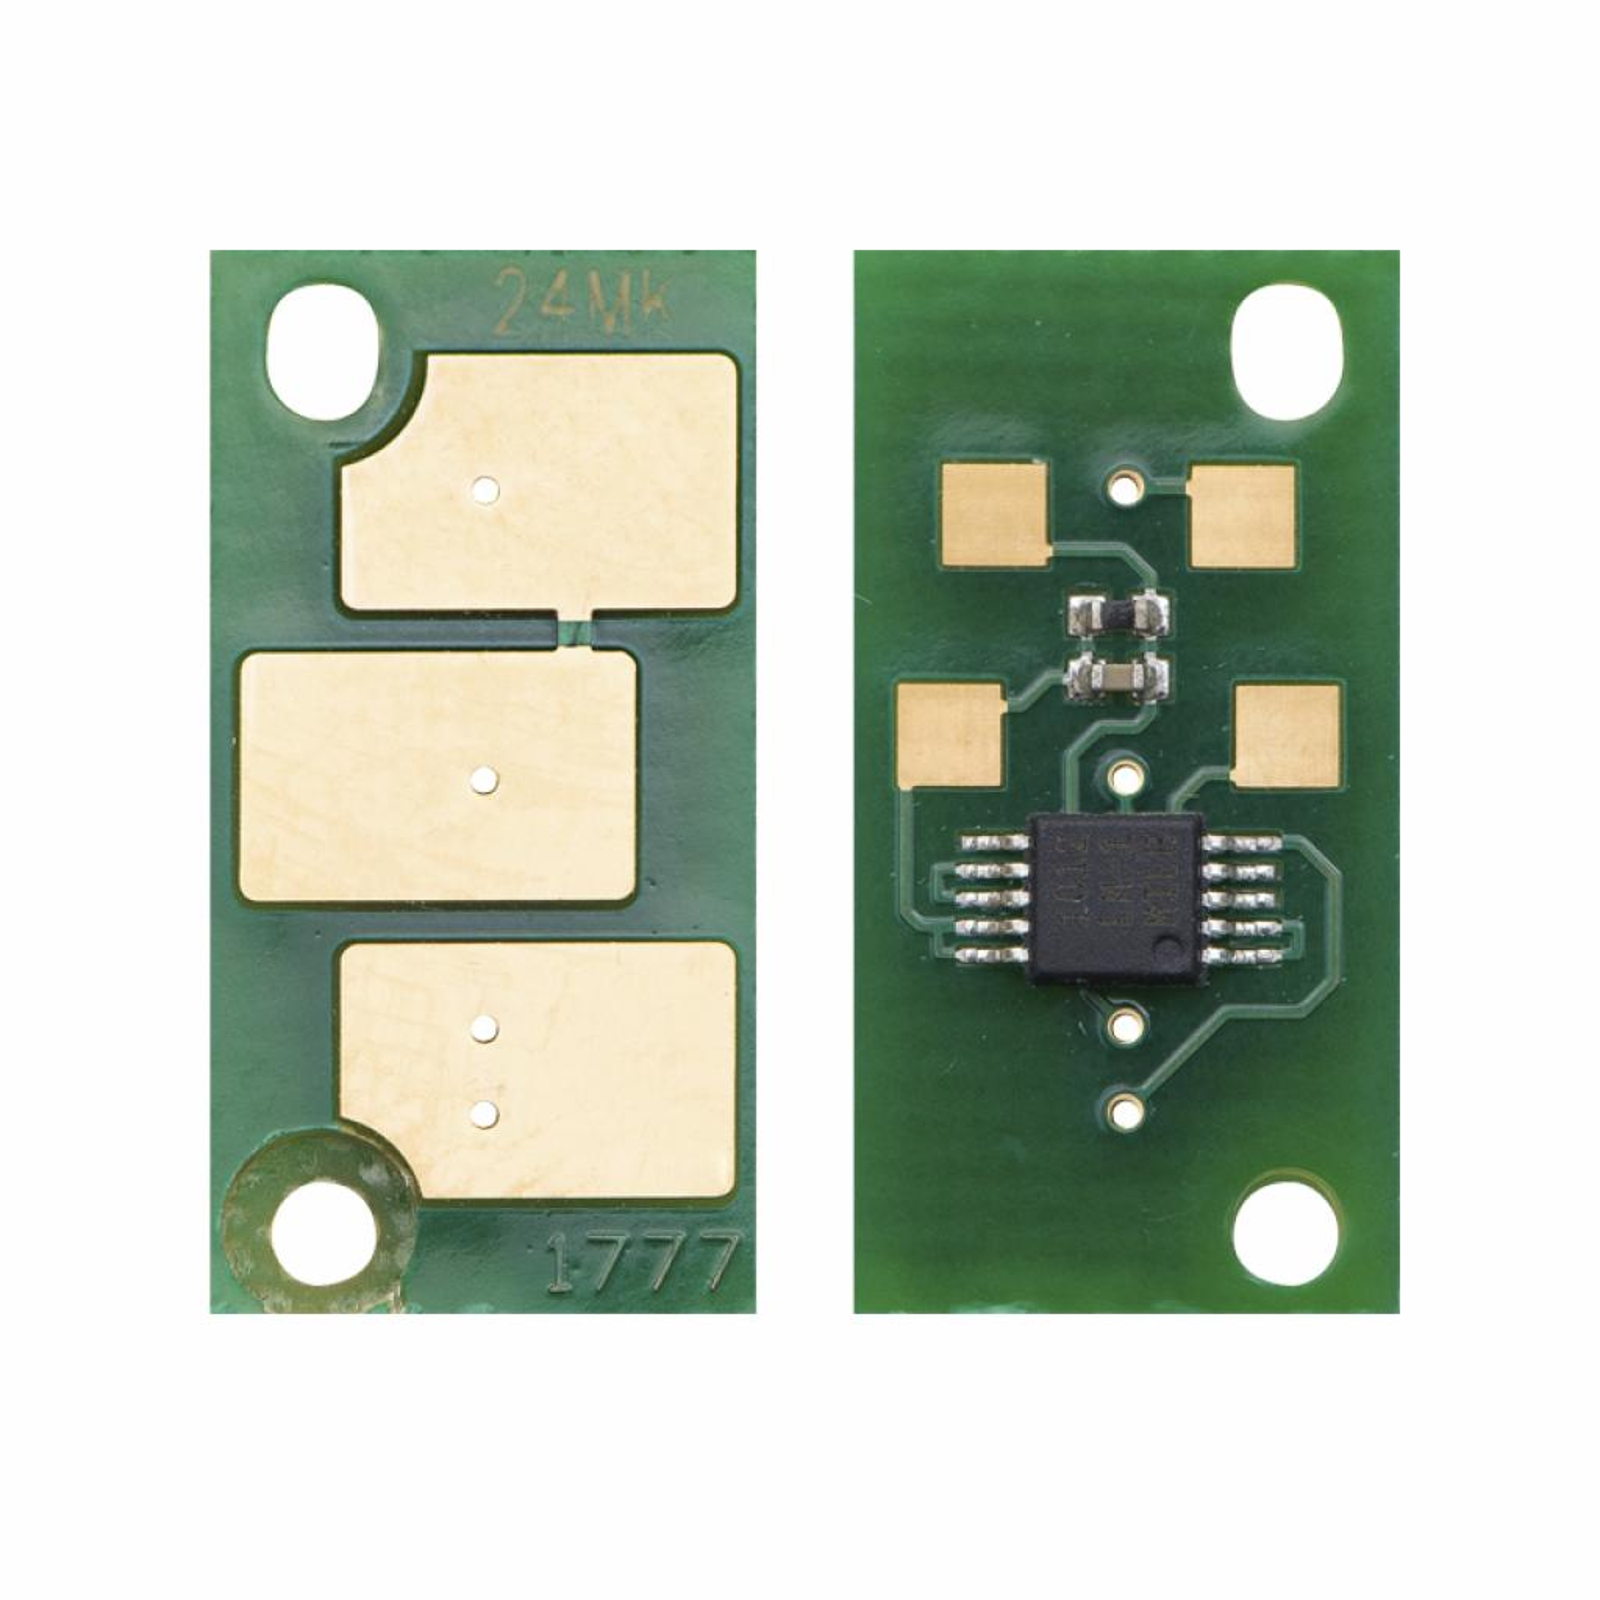 Чип для картриджа Konica Minolta Magicolor 2400 (1710589-006) (EU) 4.5k magent Static Control (KM24CHIP-MAUK)